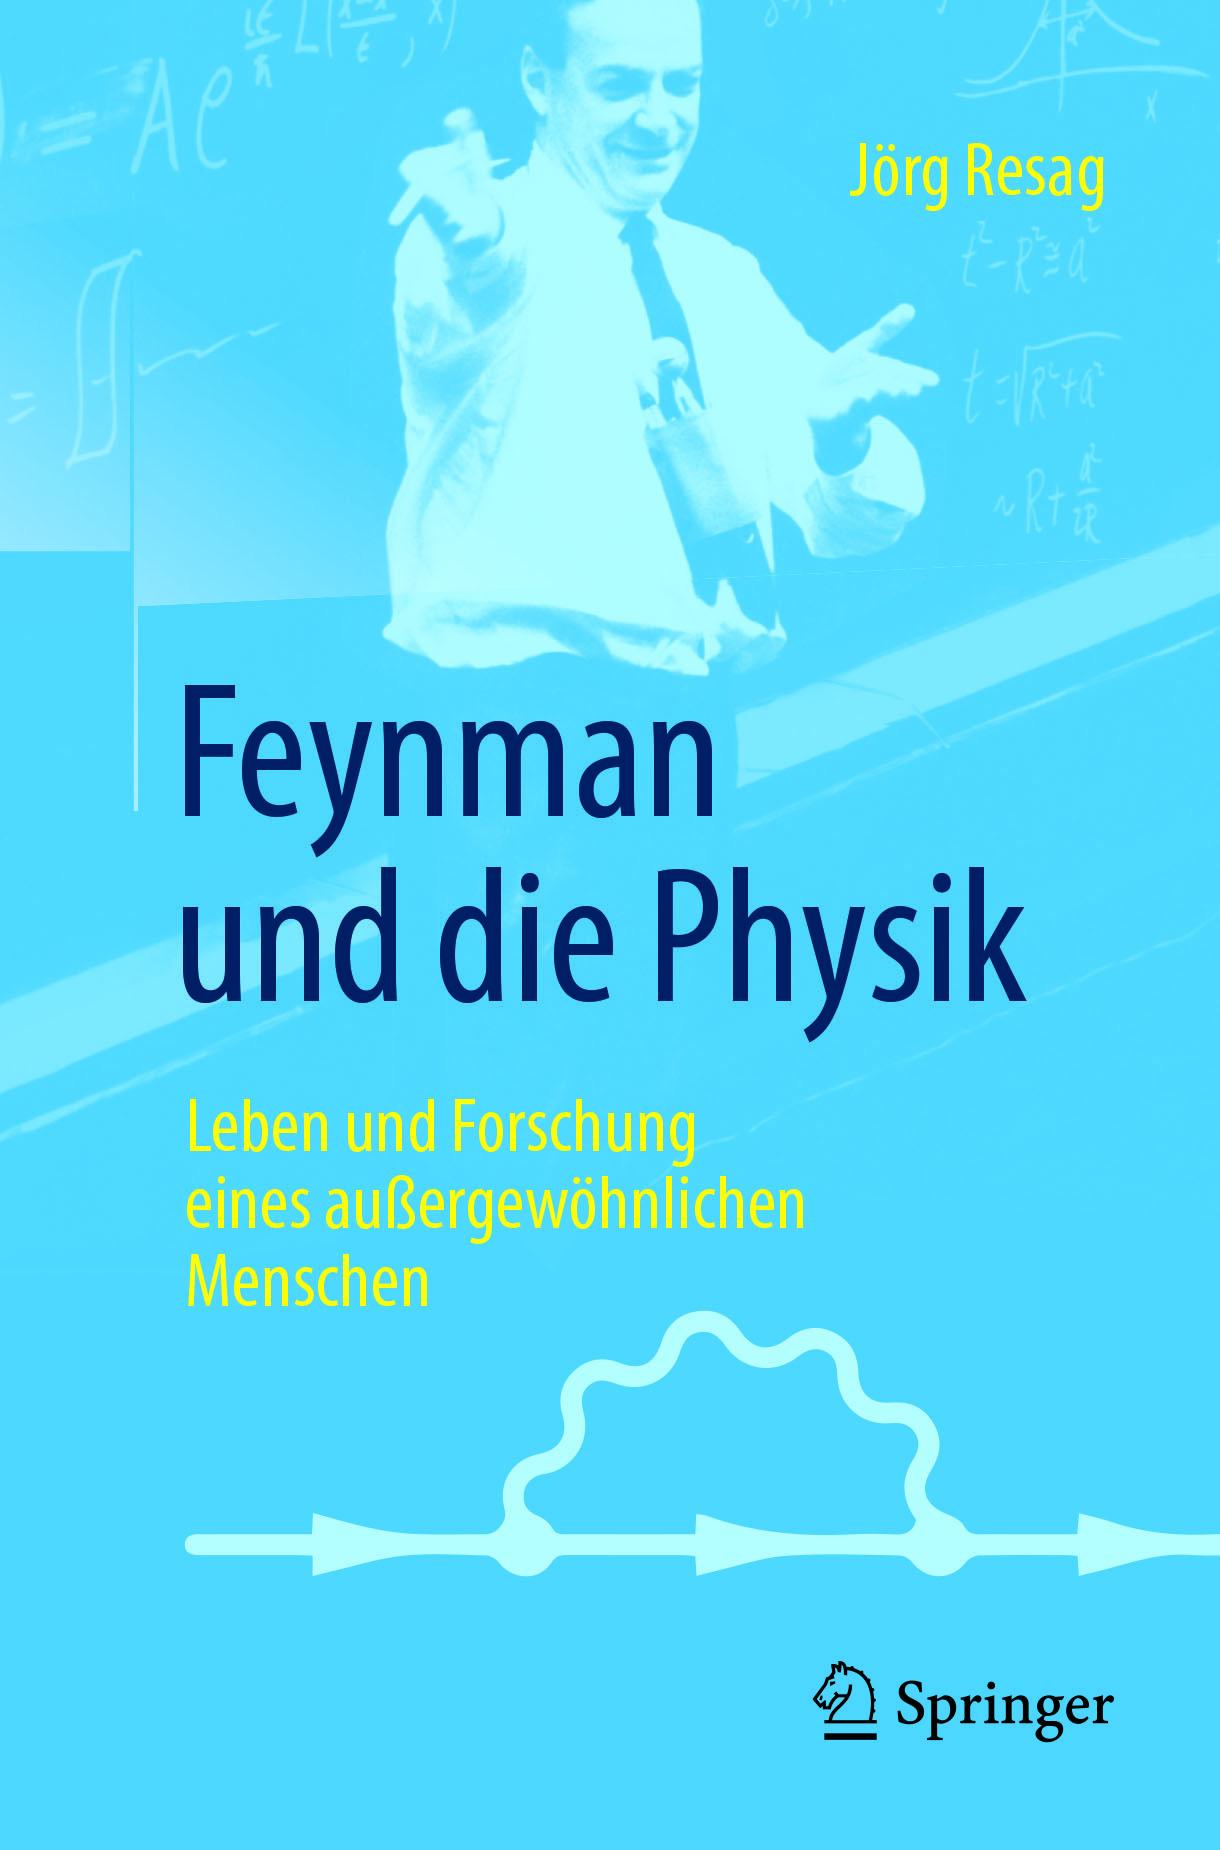 Resag, Jörg - Feynman und die Physik, ebook